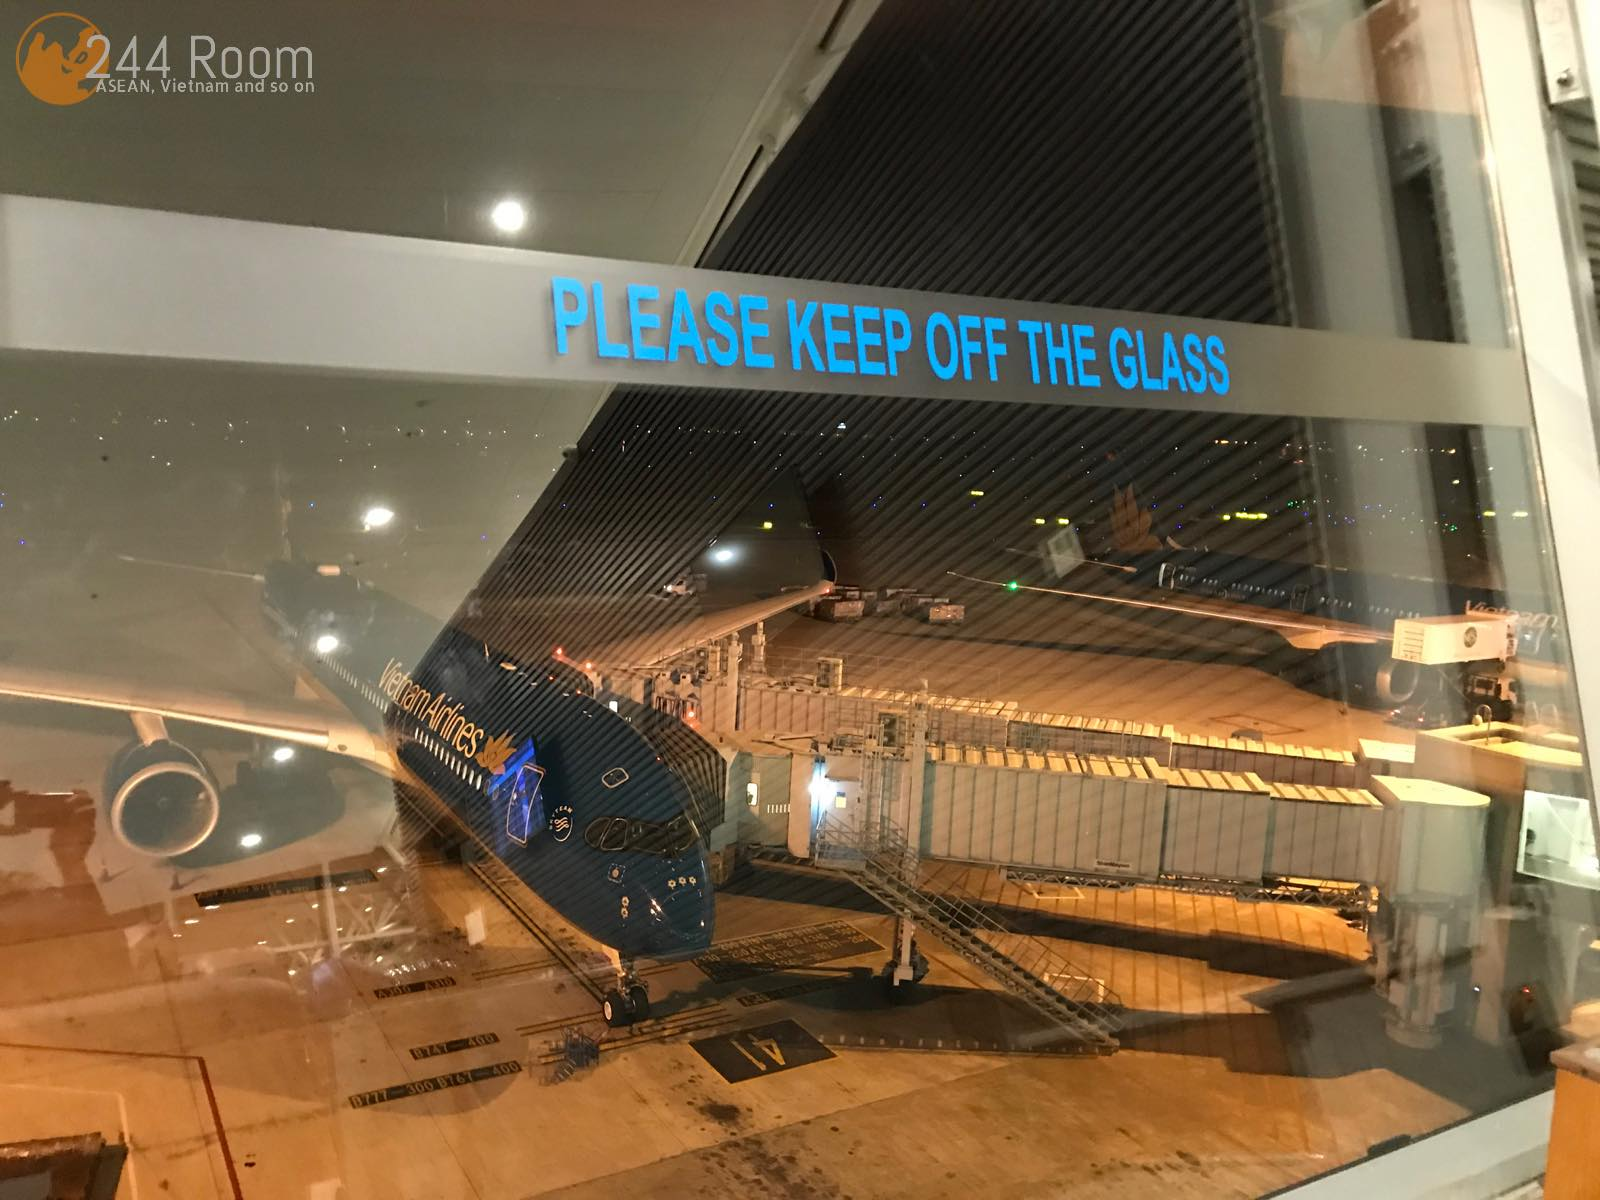 Noibai Airport Lounge ノイバイ空港ラウンジ2